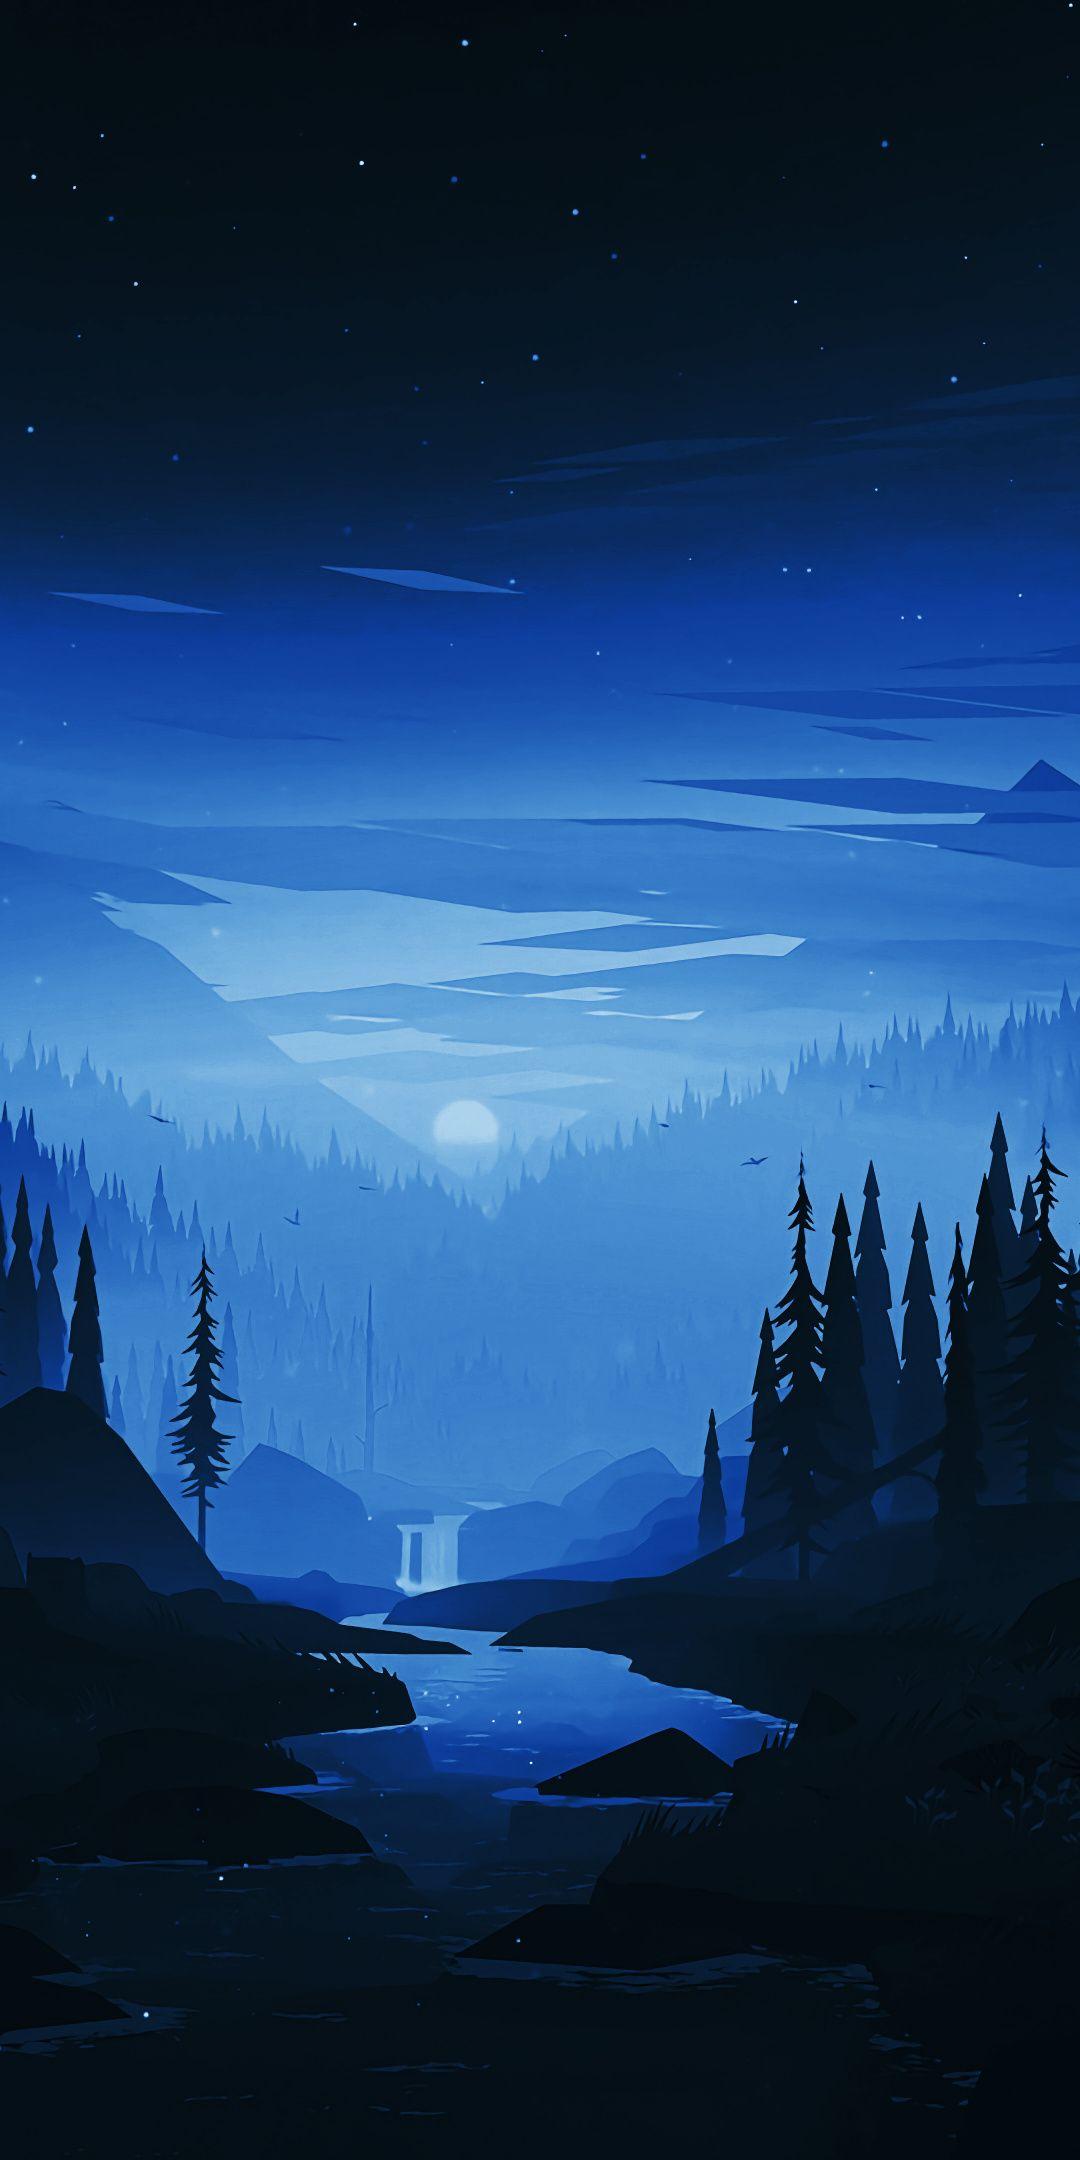 Dark Night River Forest Minimal Art 1080x2160 Wallpaper